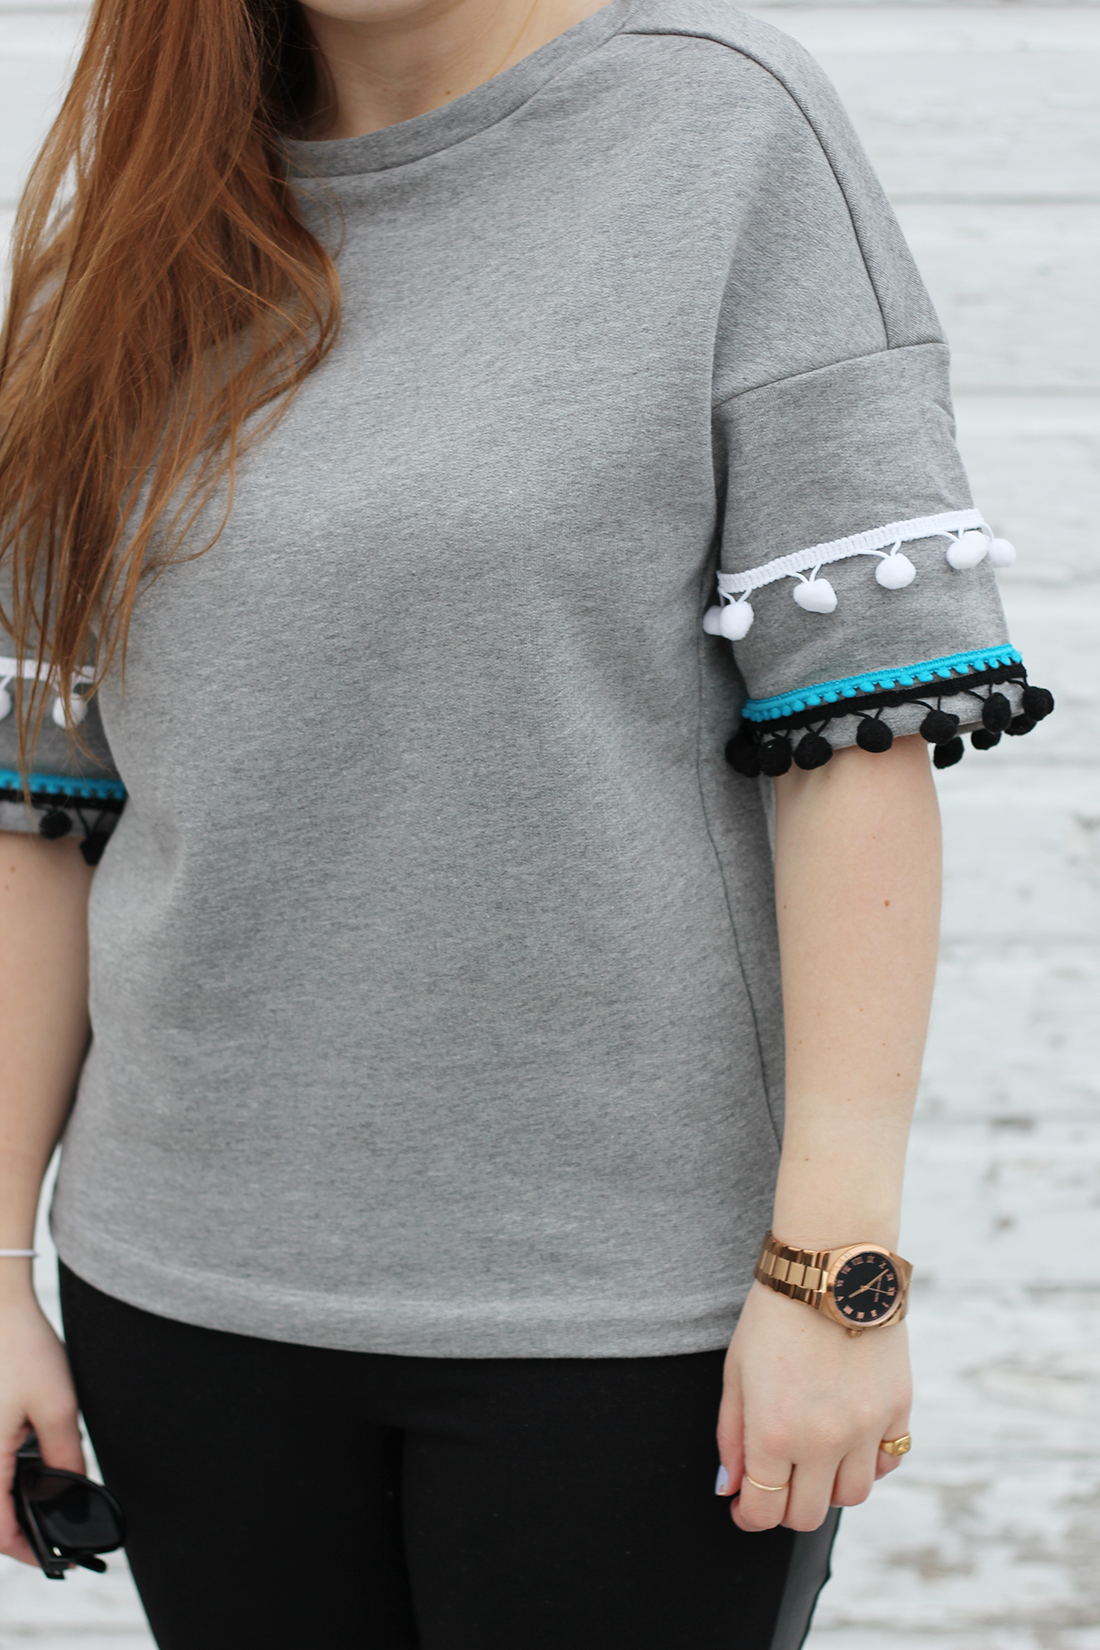 diy-pom-pom-sweatshirt-5